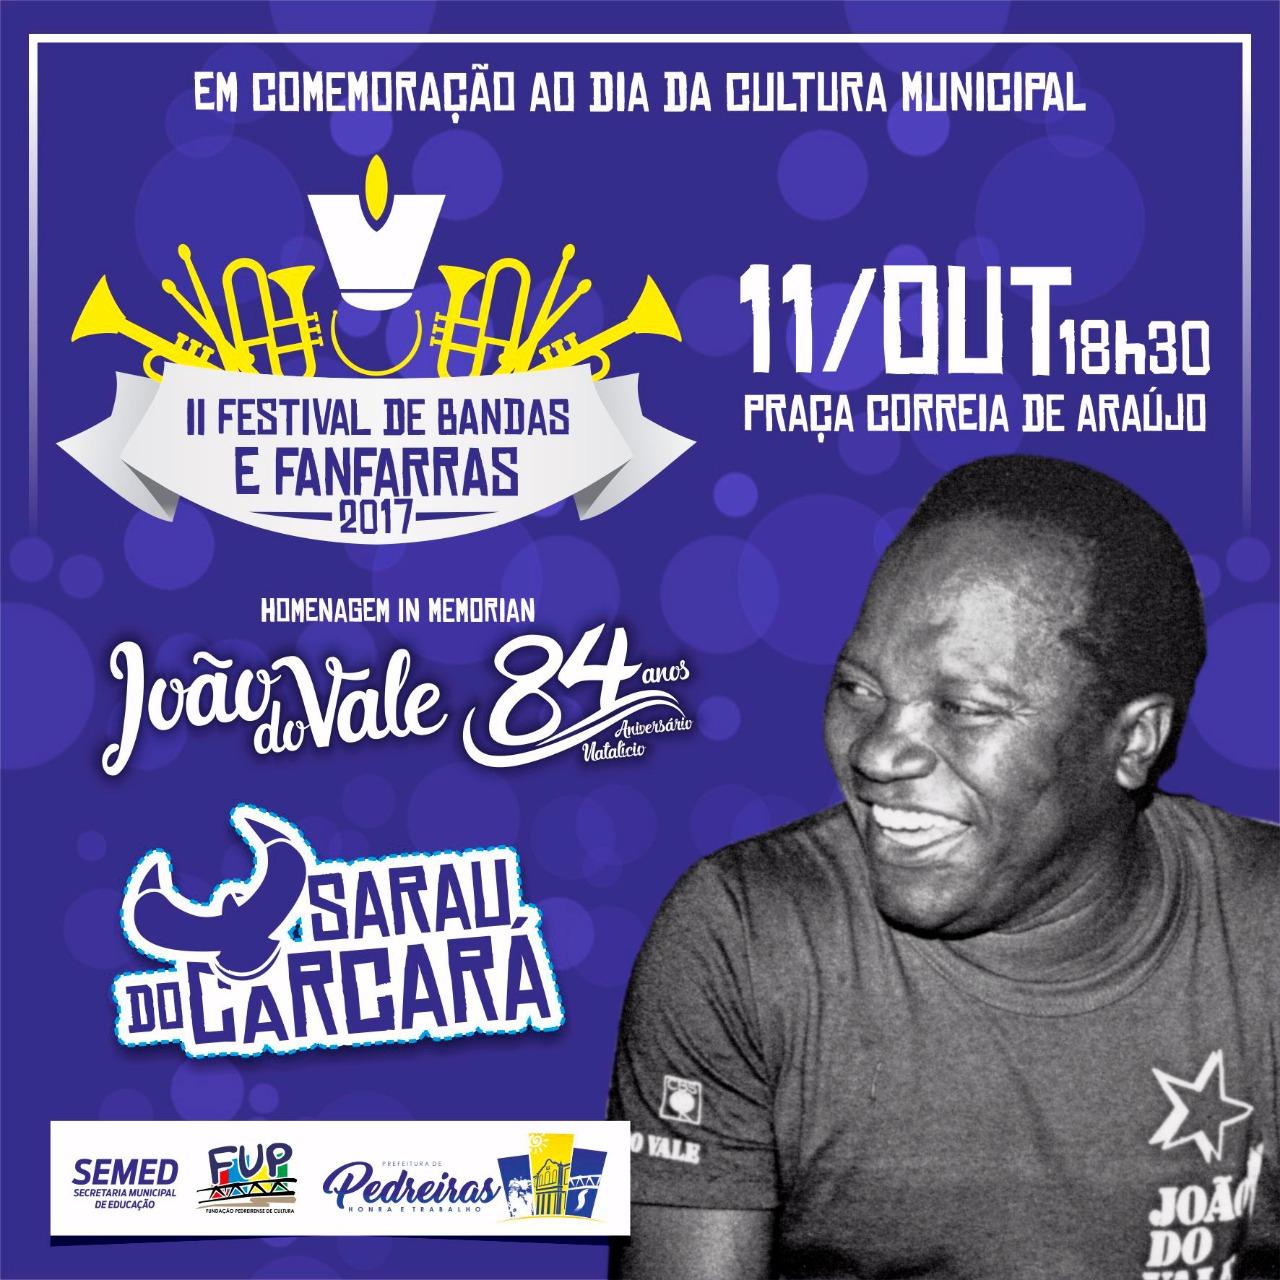 II FESTIVAL DE BANDAS E FANFARRAS